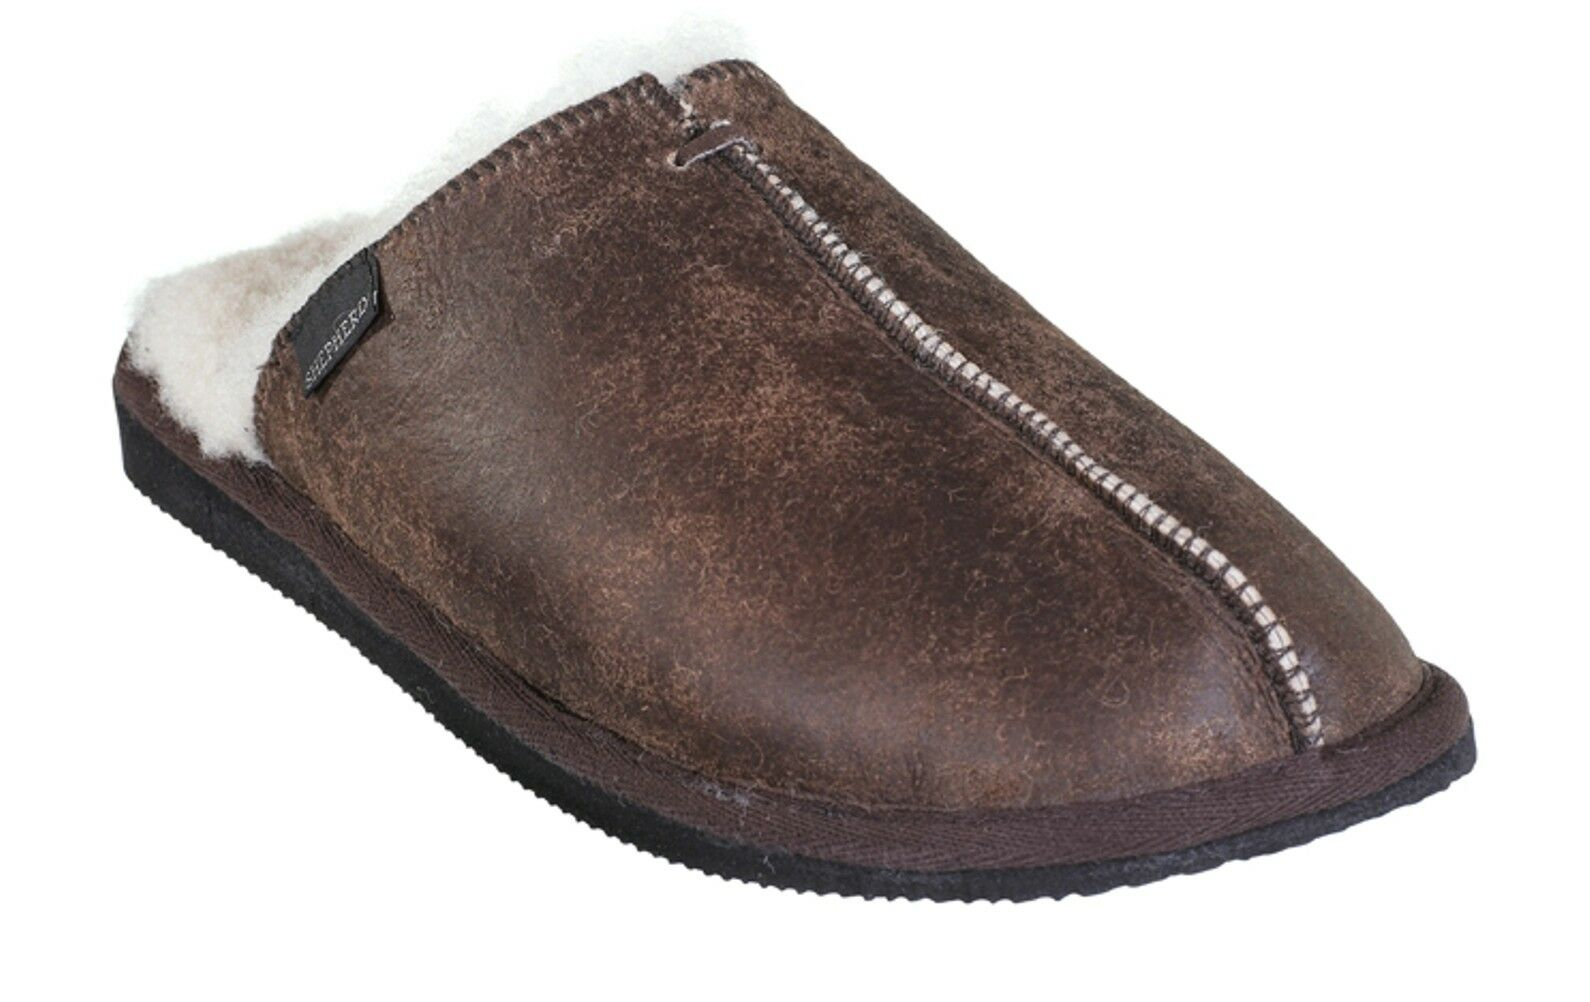 Shepherd Hugo 1201 53 Herren Hausschuhe Pantoffeln Slipper 47 oild Gr. 42 - 47 Slipper Neu 2162b1